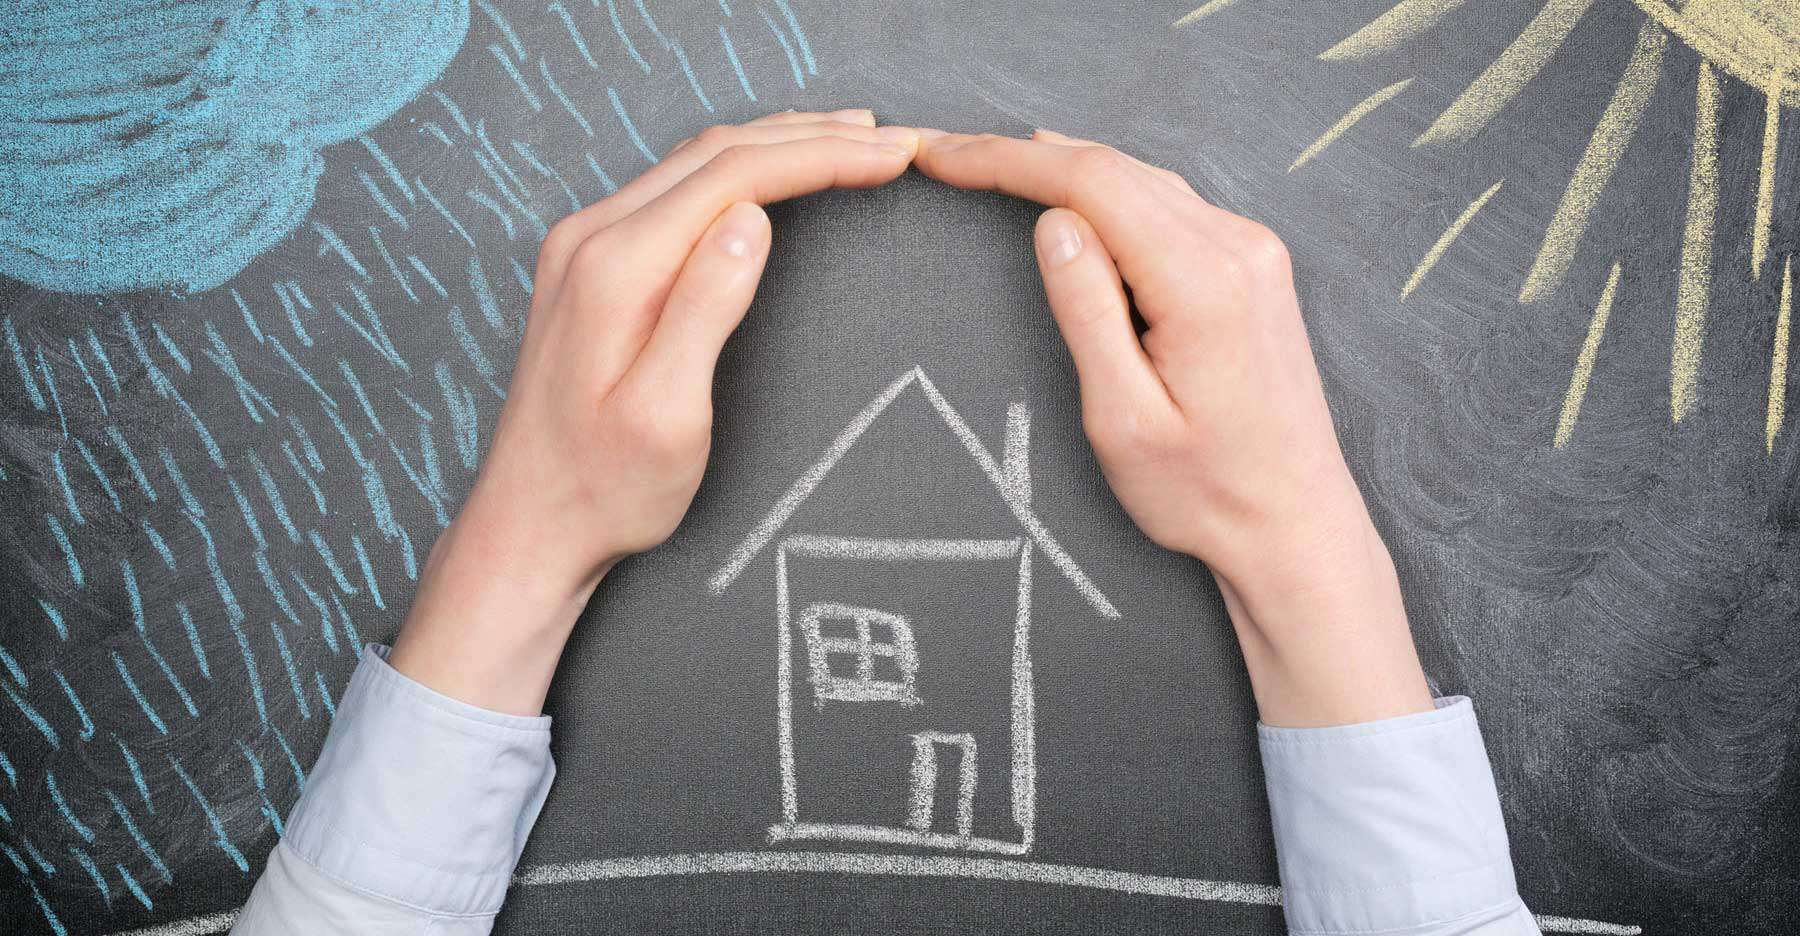 покупка имущества при банкротстве